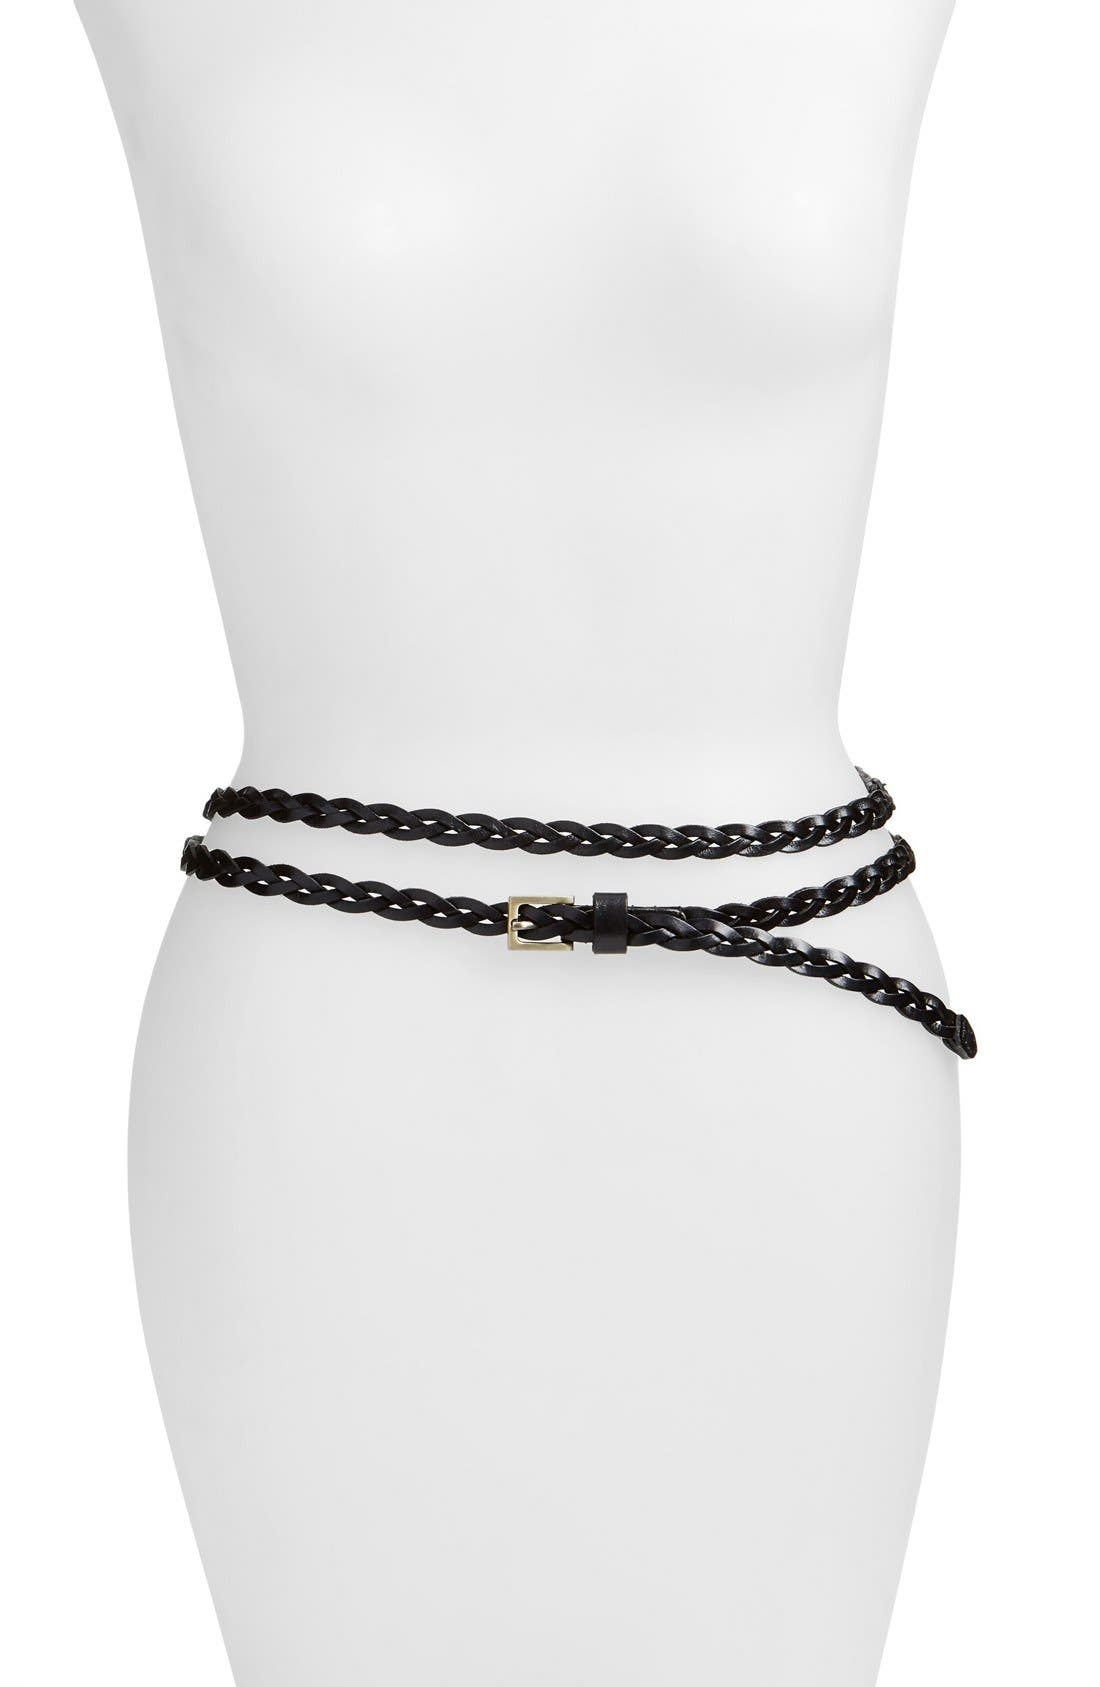 Main Image - Elise M. 'Florence' Calfskin Leather Double Wrap Belt